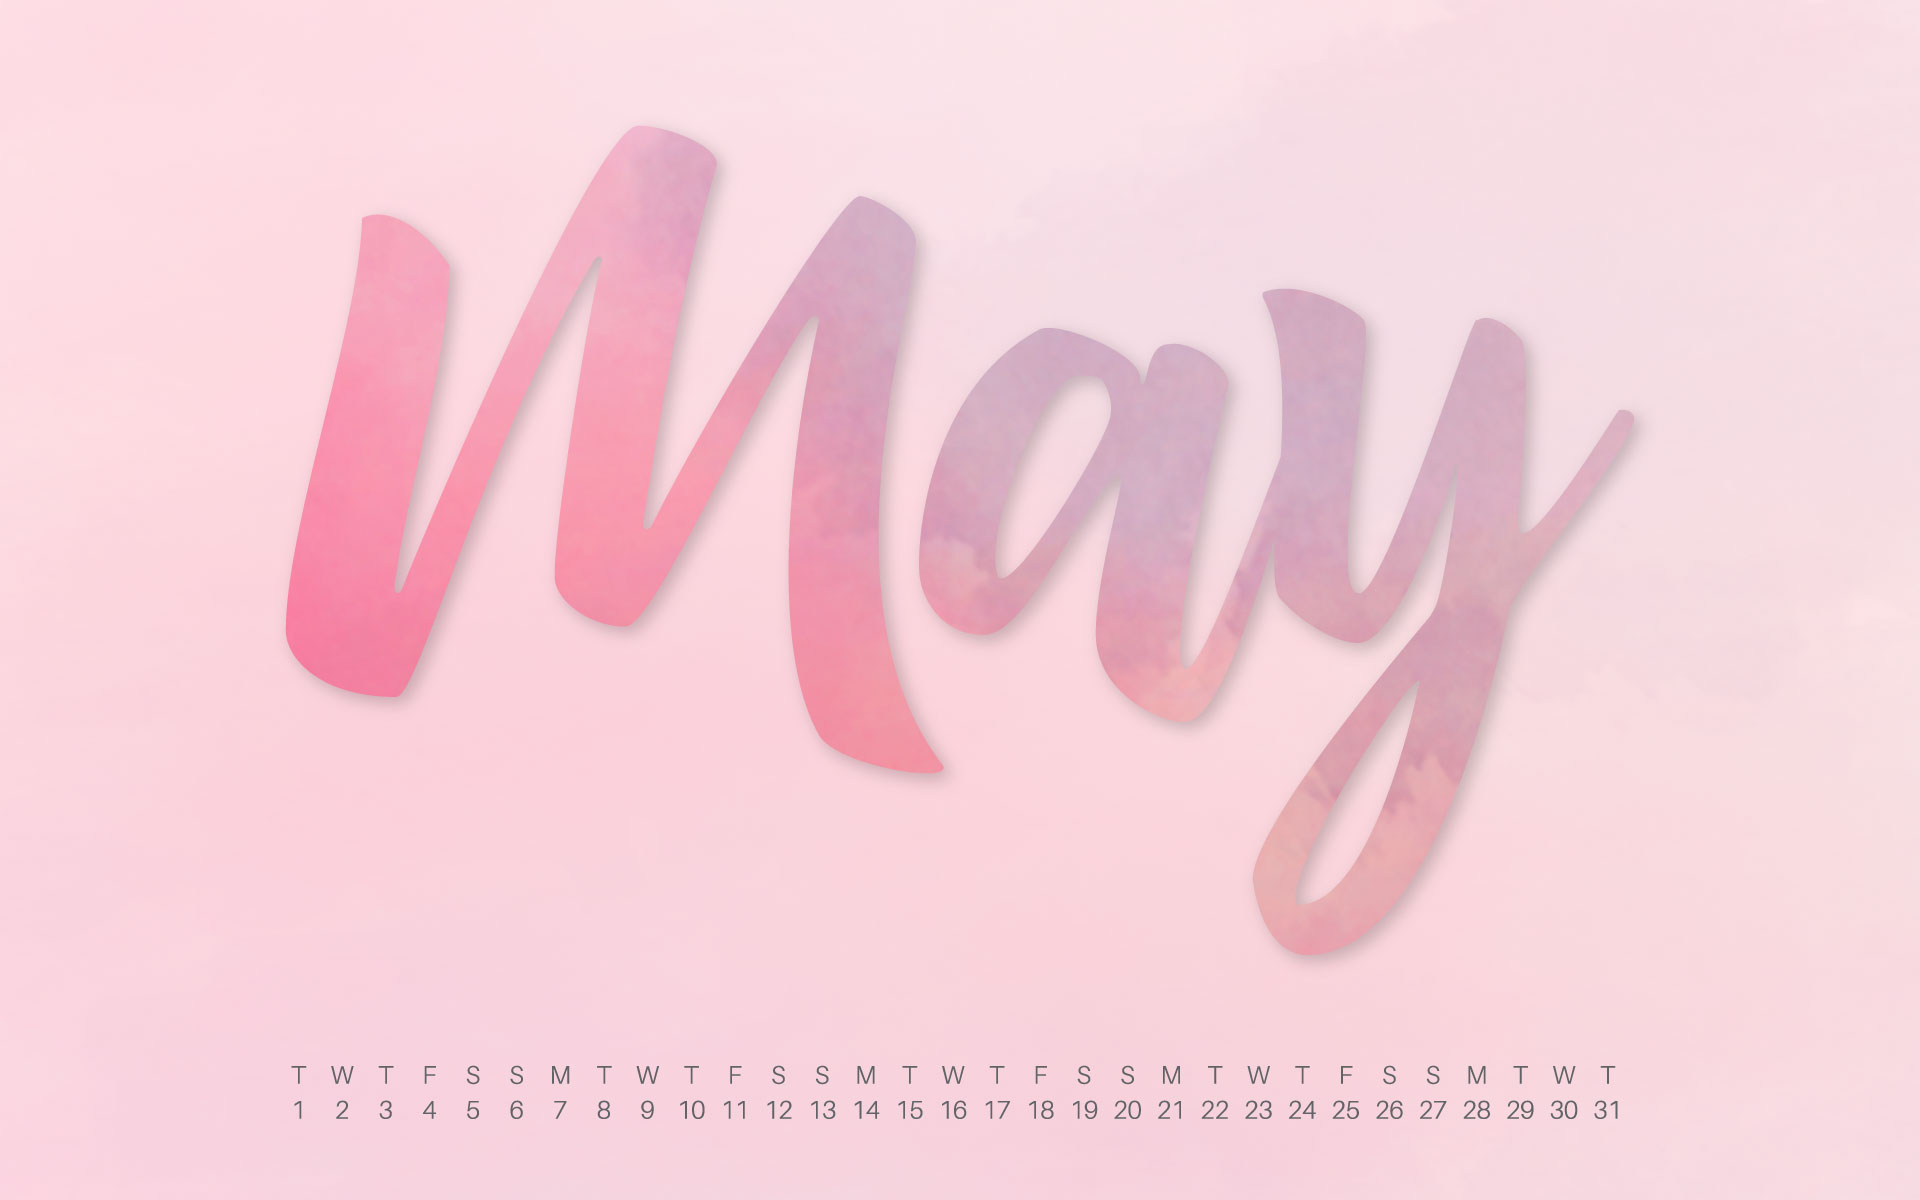 Uppercase Designs May 2018 Desktop Calendar Wallpaper